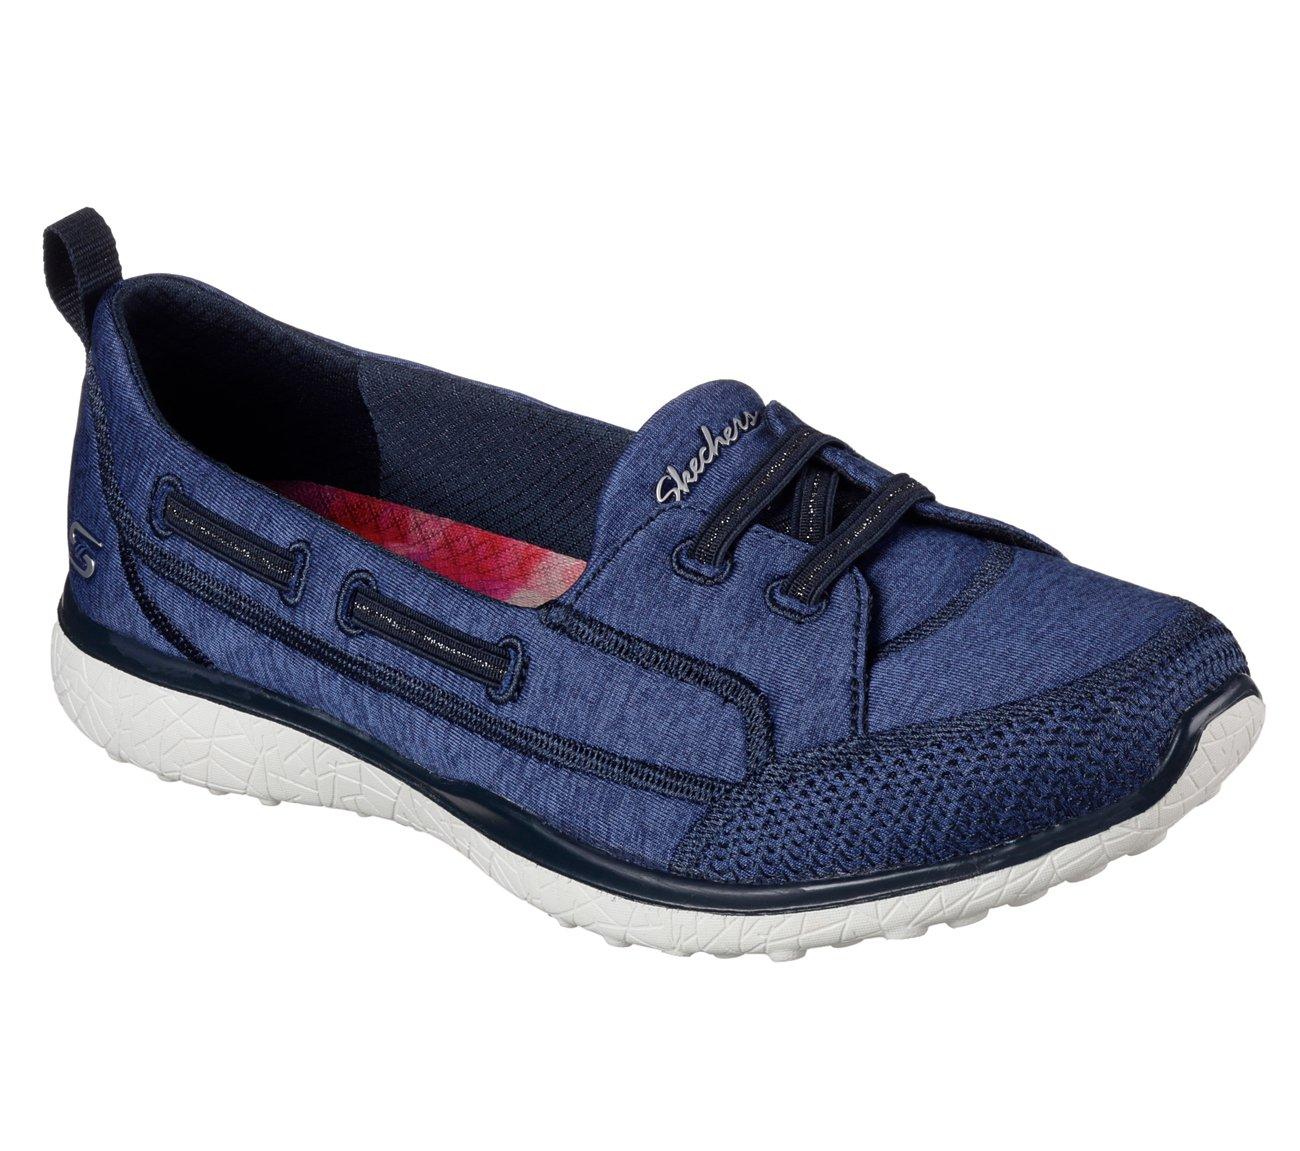 Skechers Microburst Topnotch Womens Slip On Sneakers Navy 8.5 W